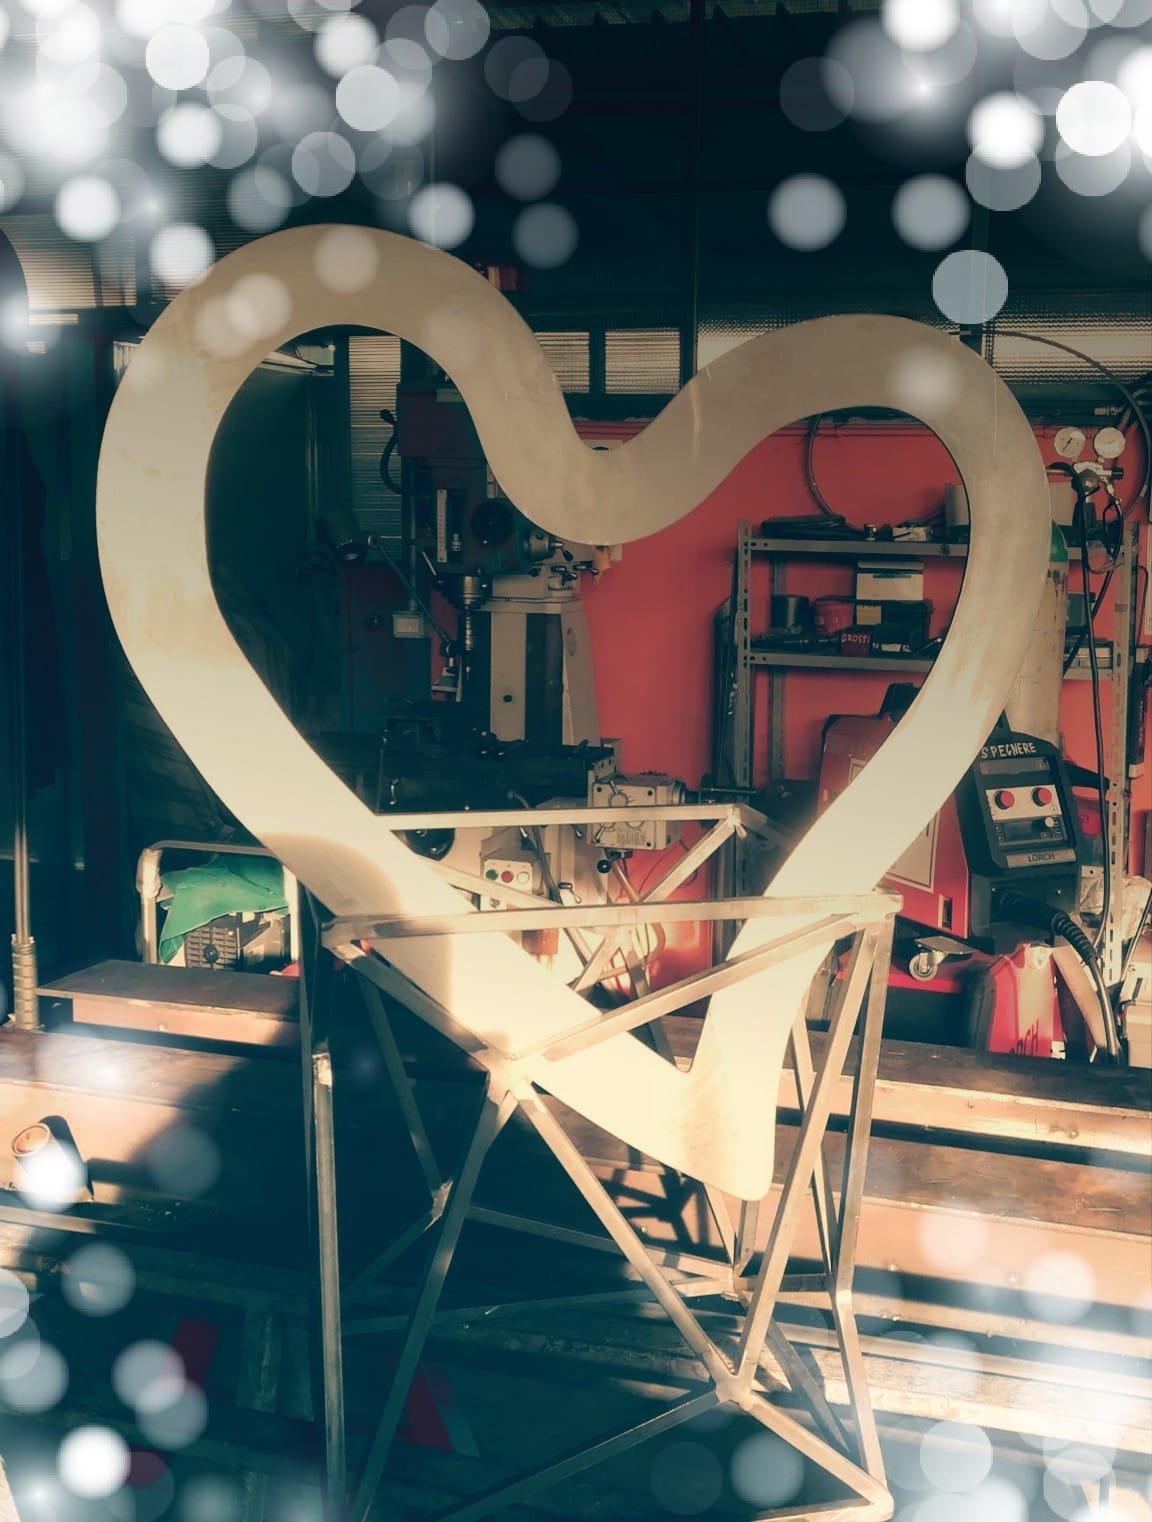 With Love.xxoh8d49576140d89c5a430b53fb6548c708oe5ce046ee.jpeg